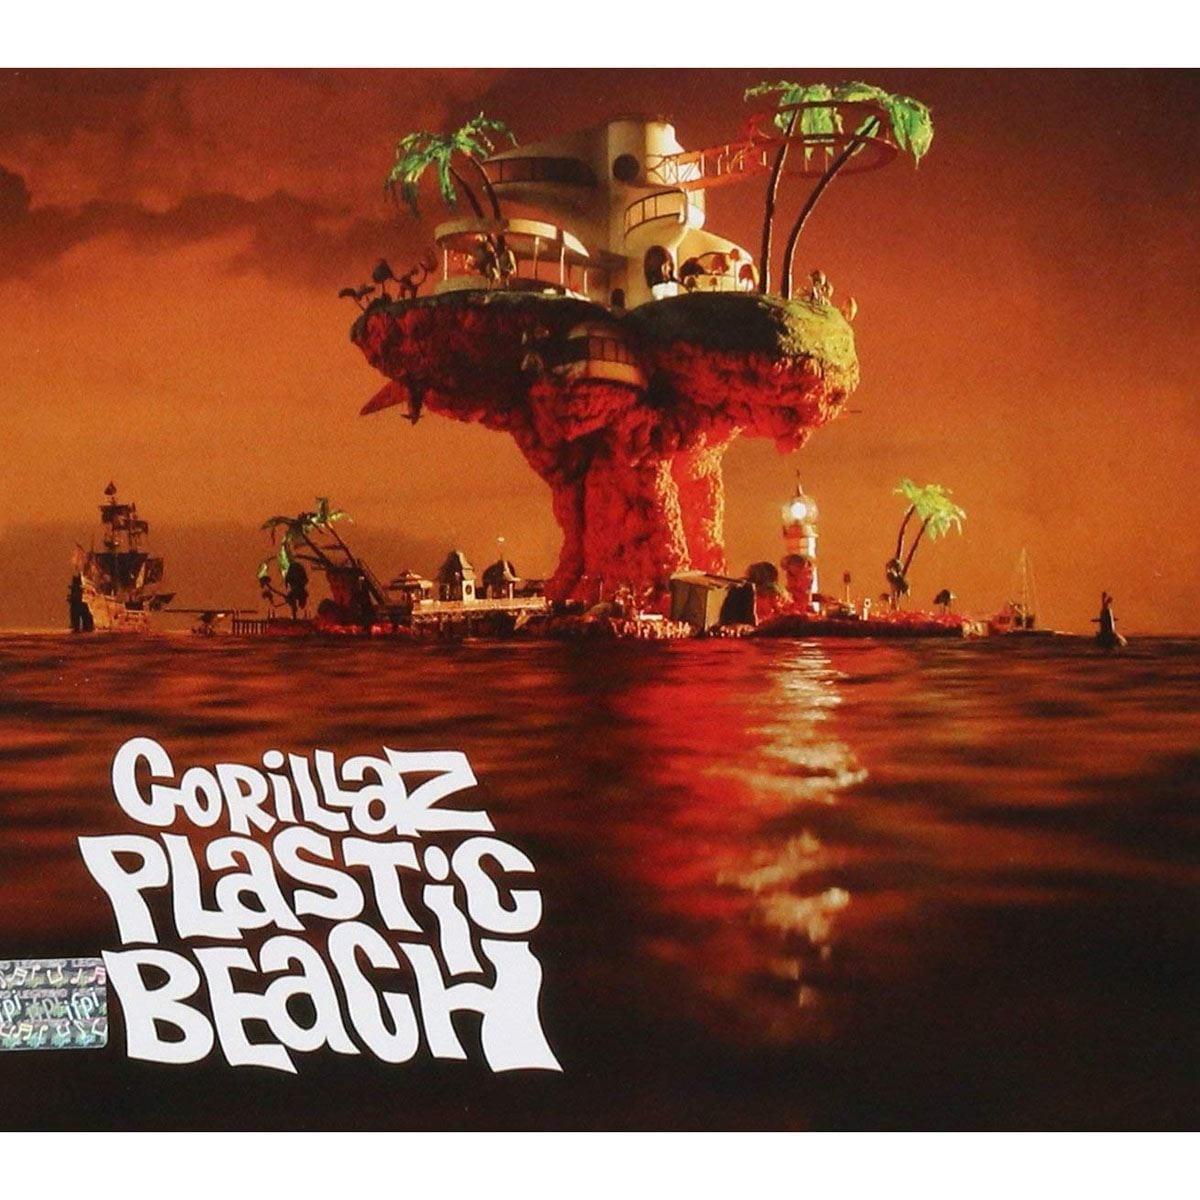 CD Gorillaz-Plastic Beach